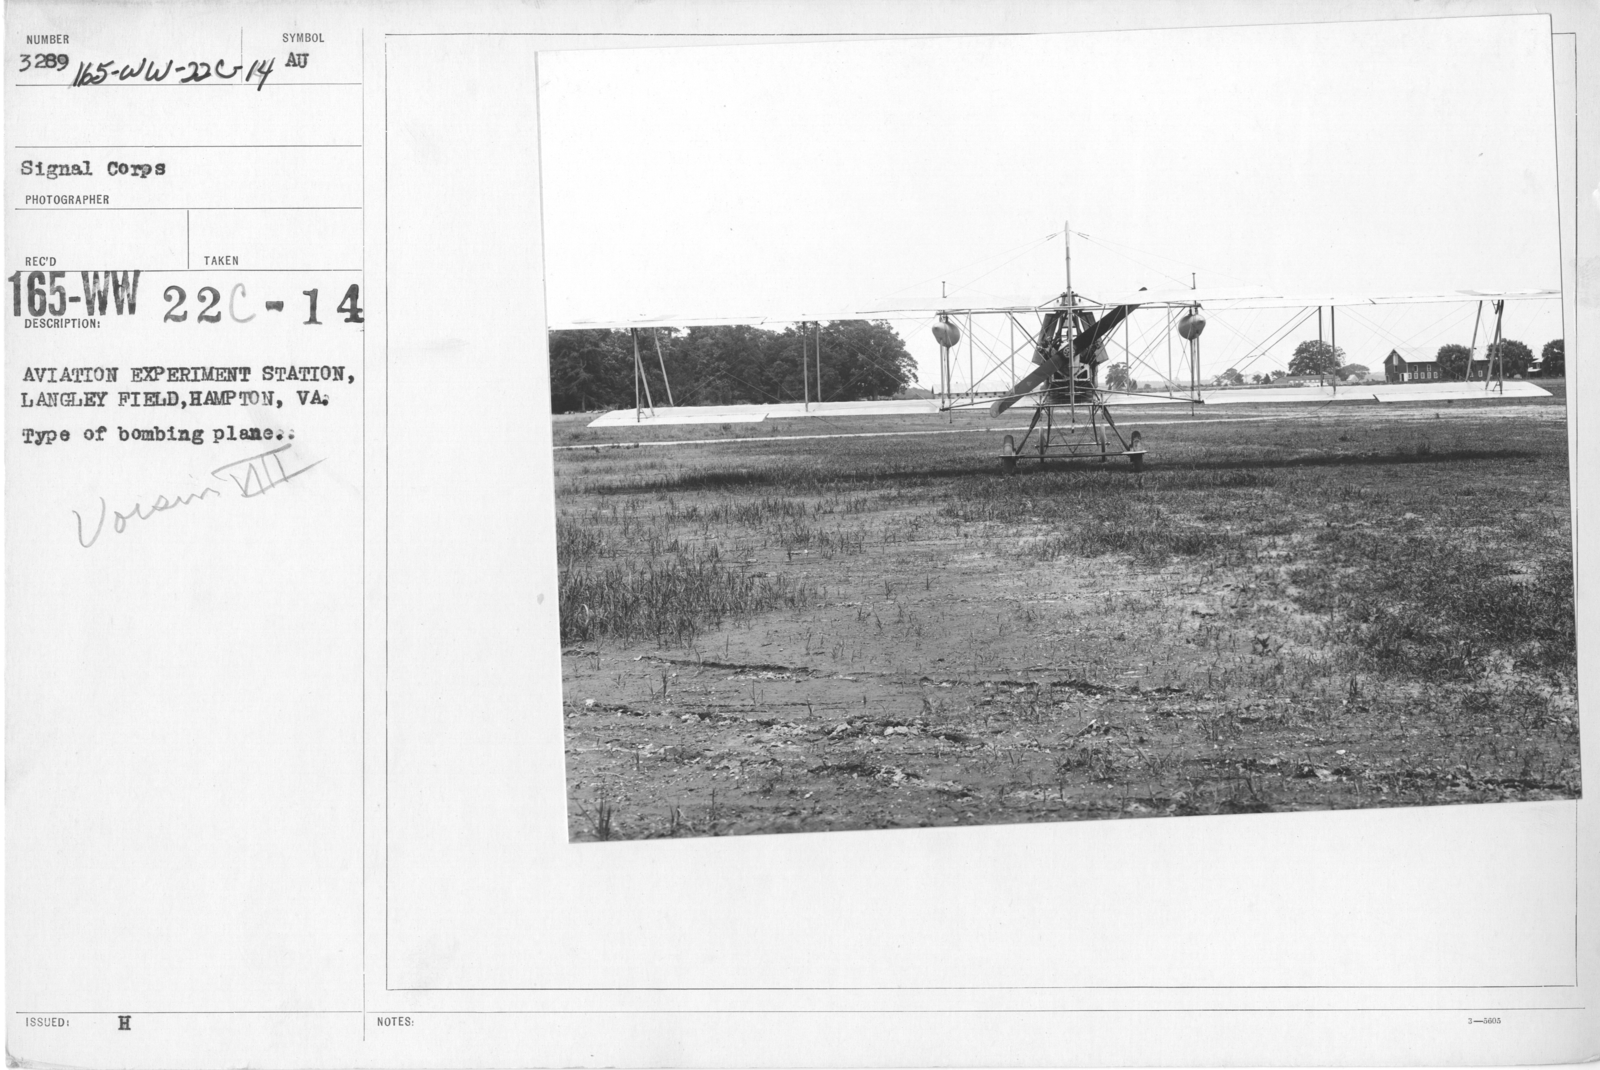 Airplanes - Types - Aviation Experiment Station, Langley Field, Hampton, VA. Type of bombing plane